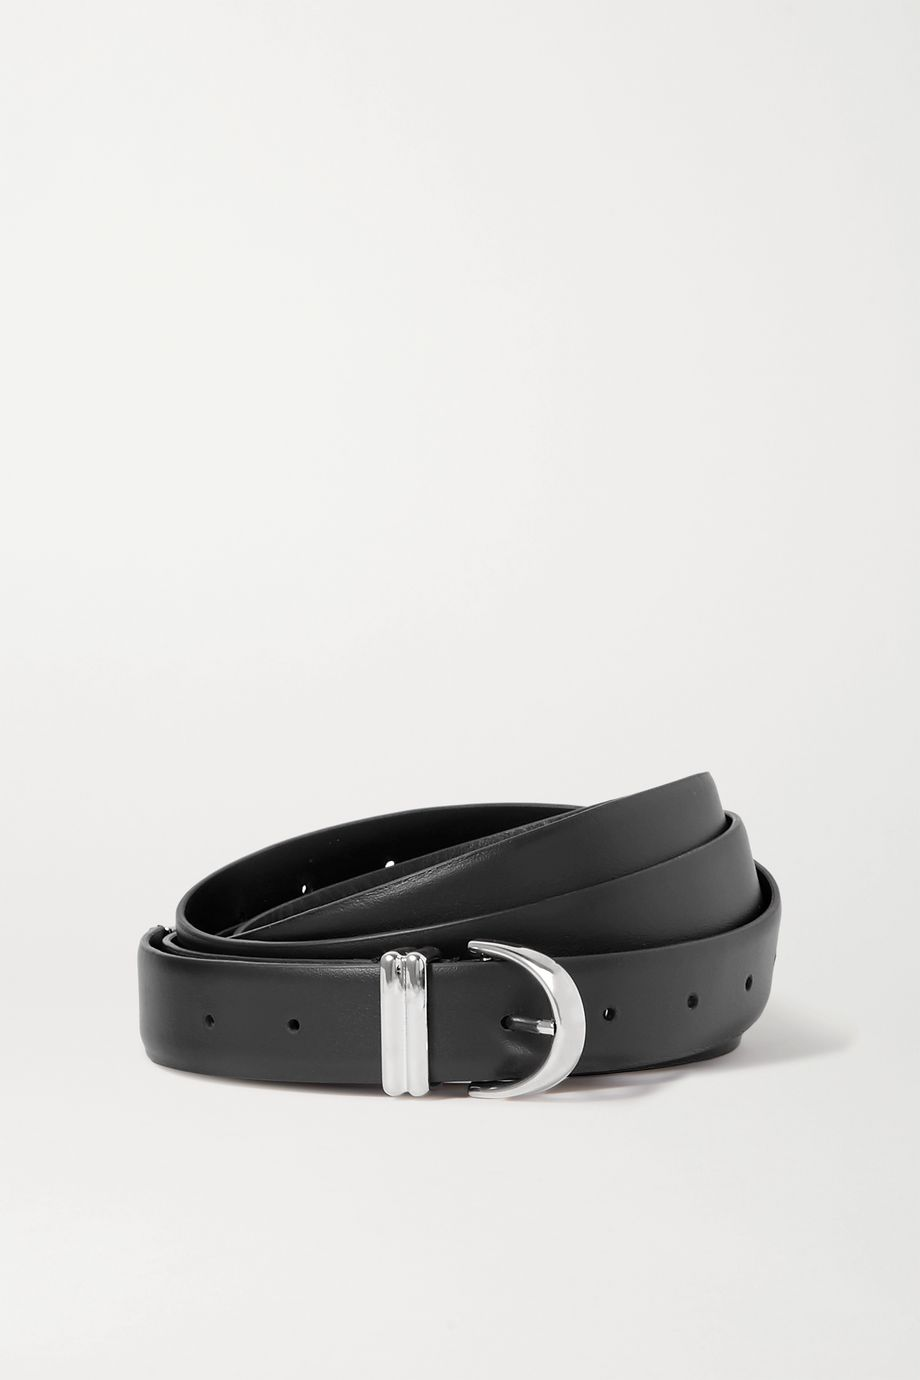 Khaite Brooke leather belt